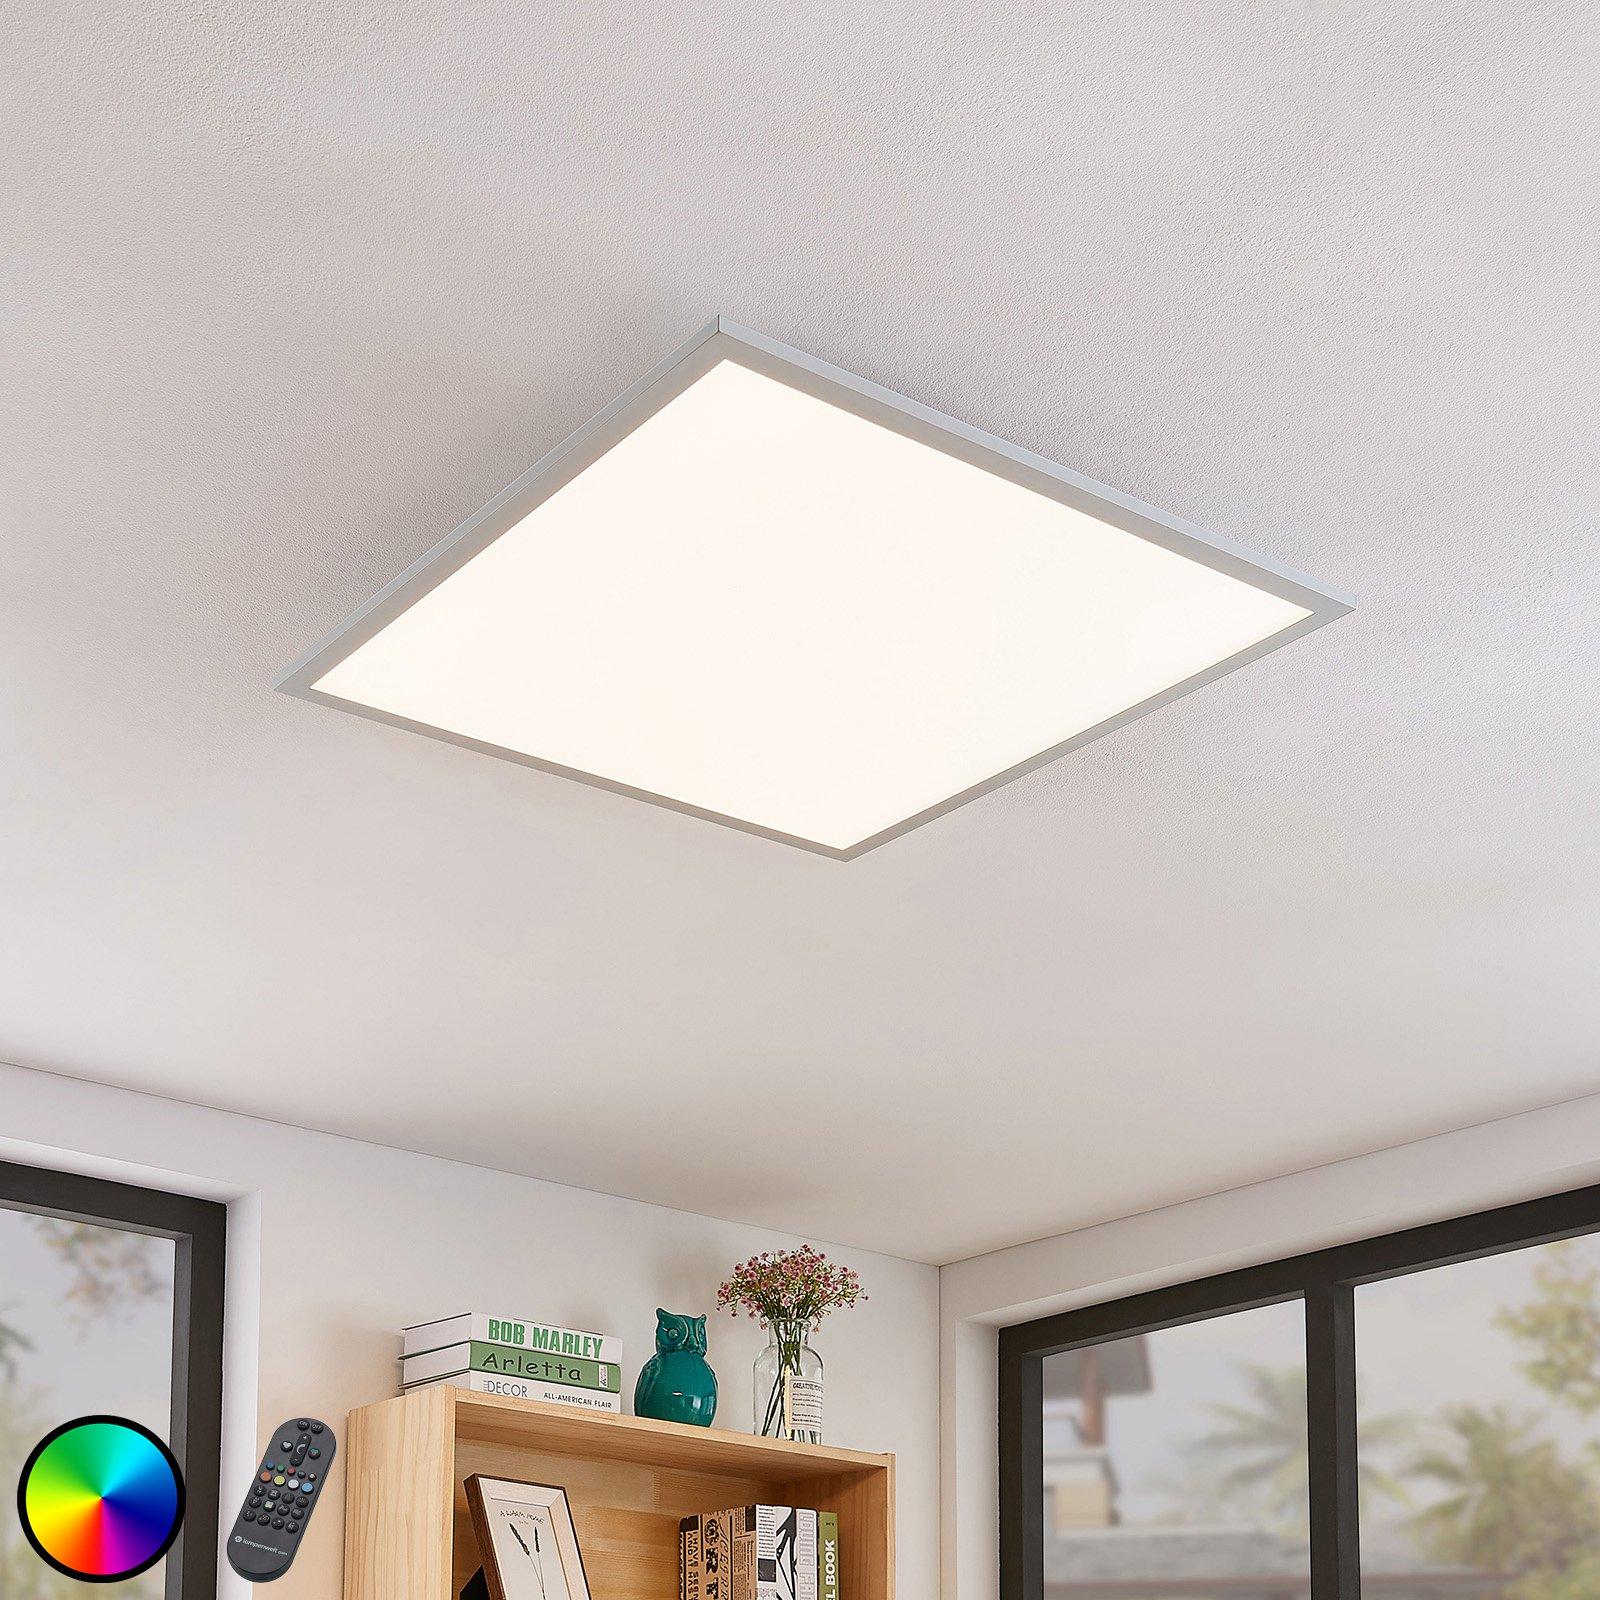 LED-taklampe Milian med fjernkontroll 62x62cm